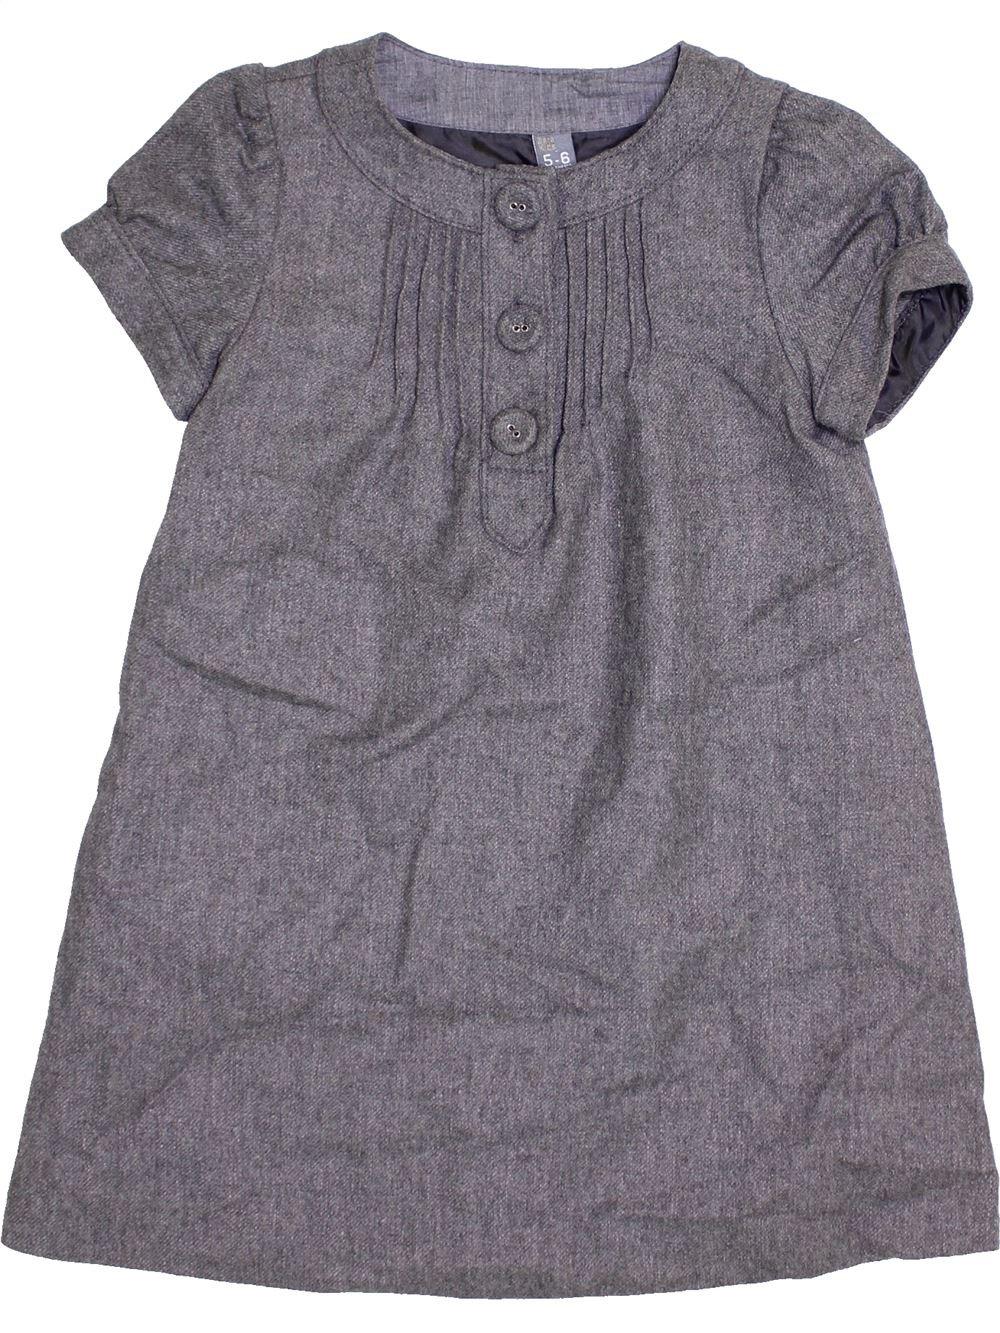 3fb8674b19e Robe violet ZARA du 6 ans pour Fille - 1398680